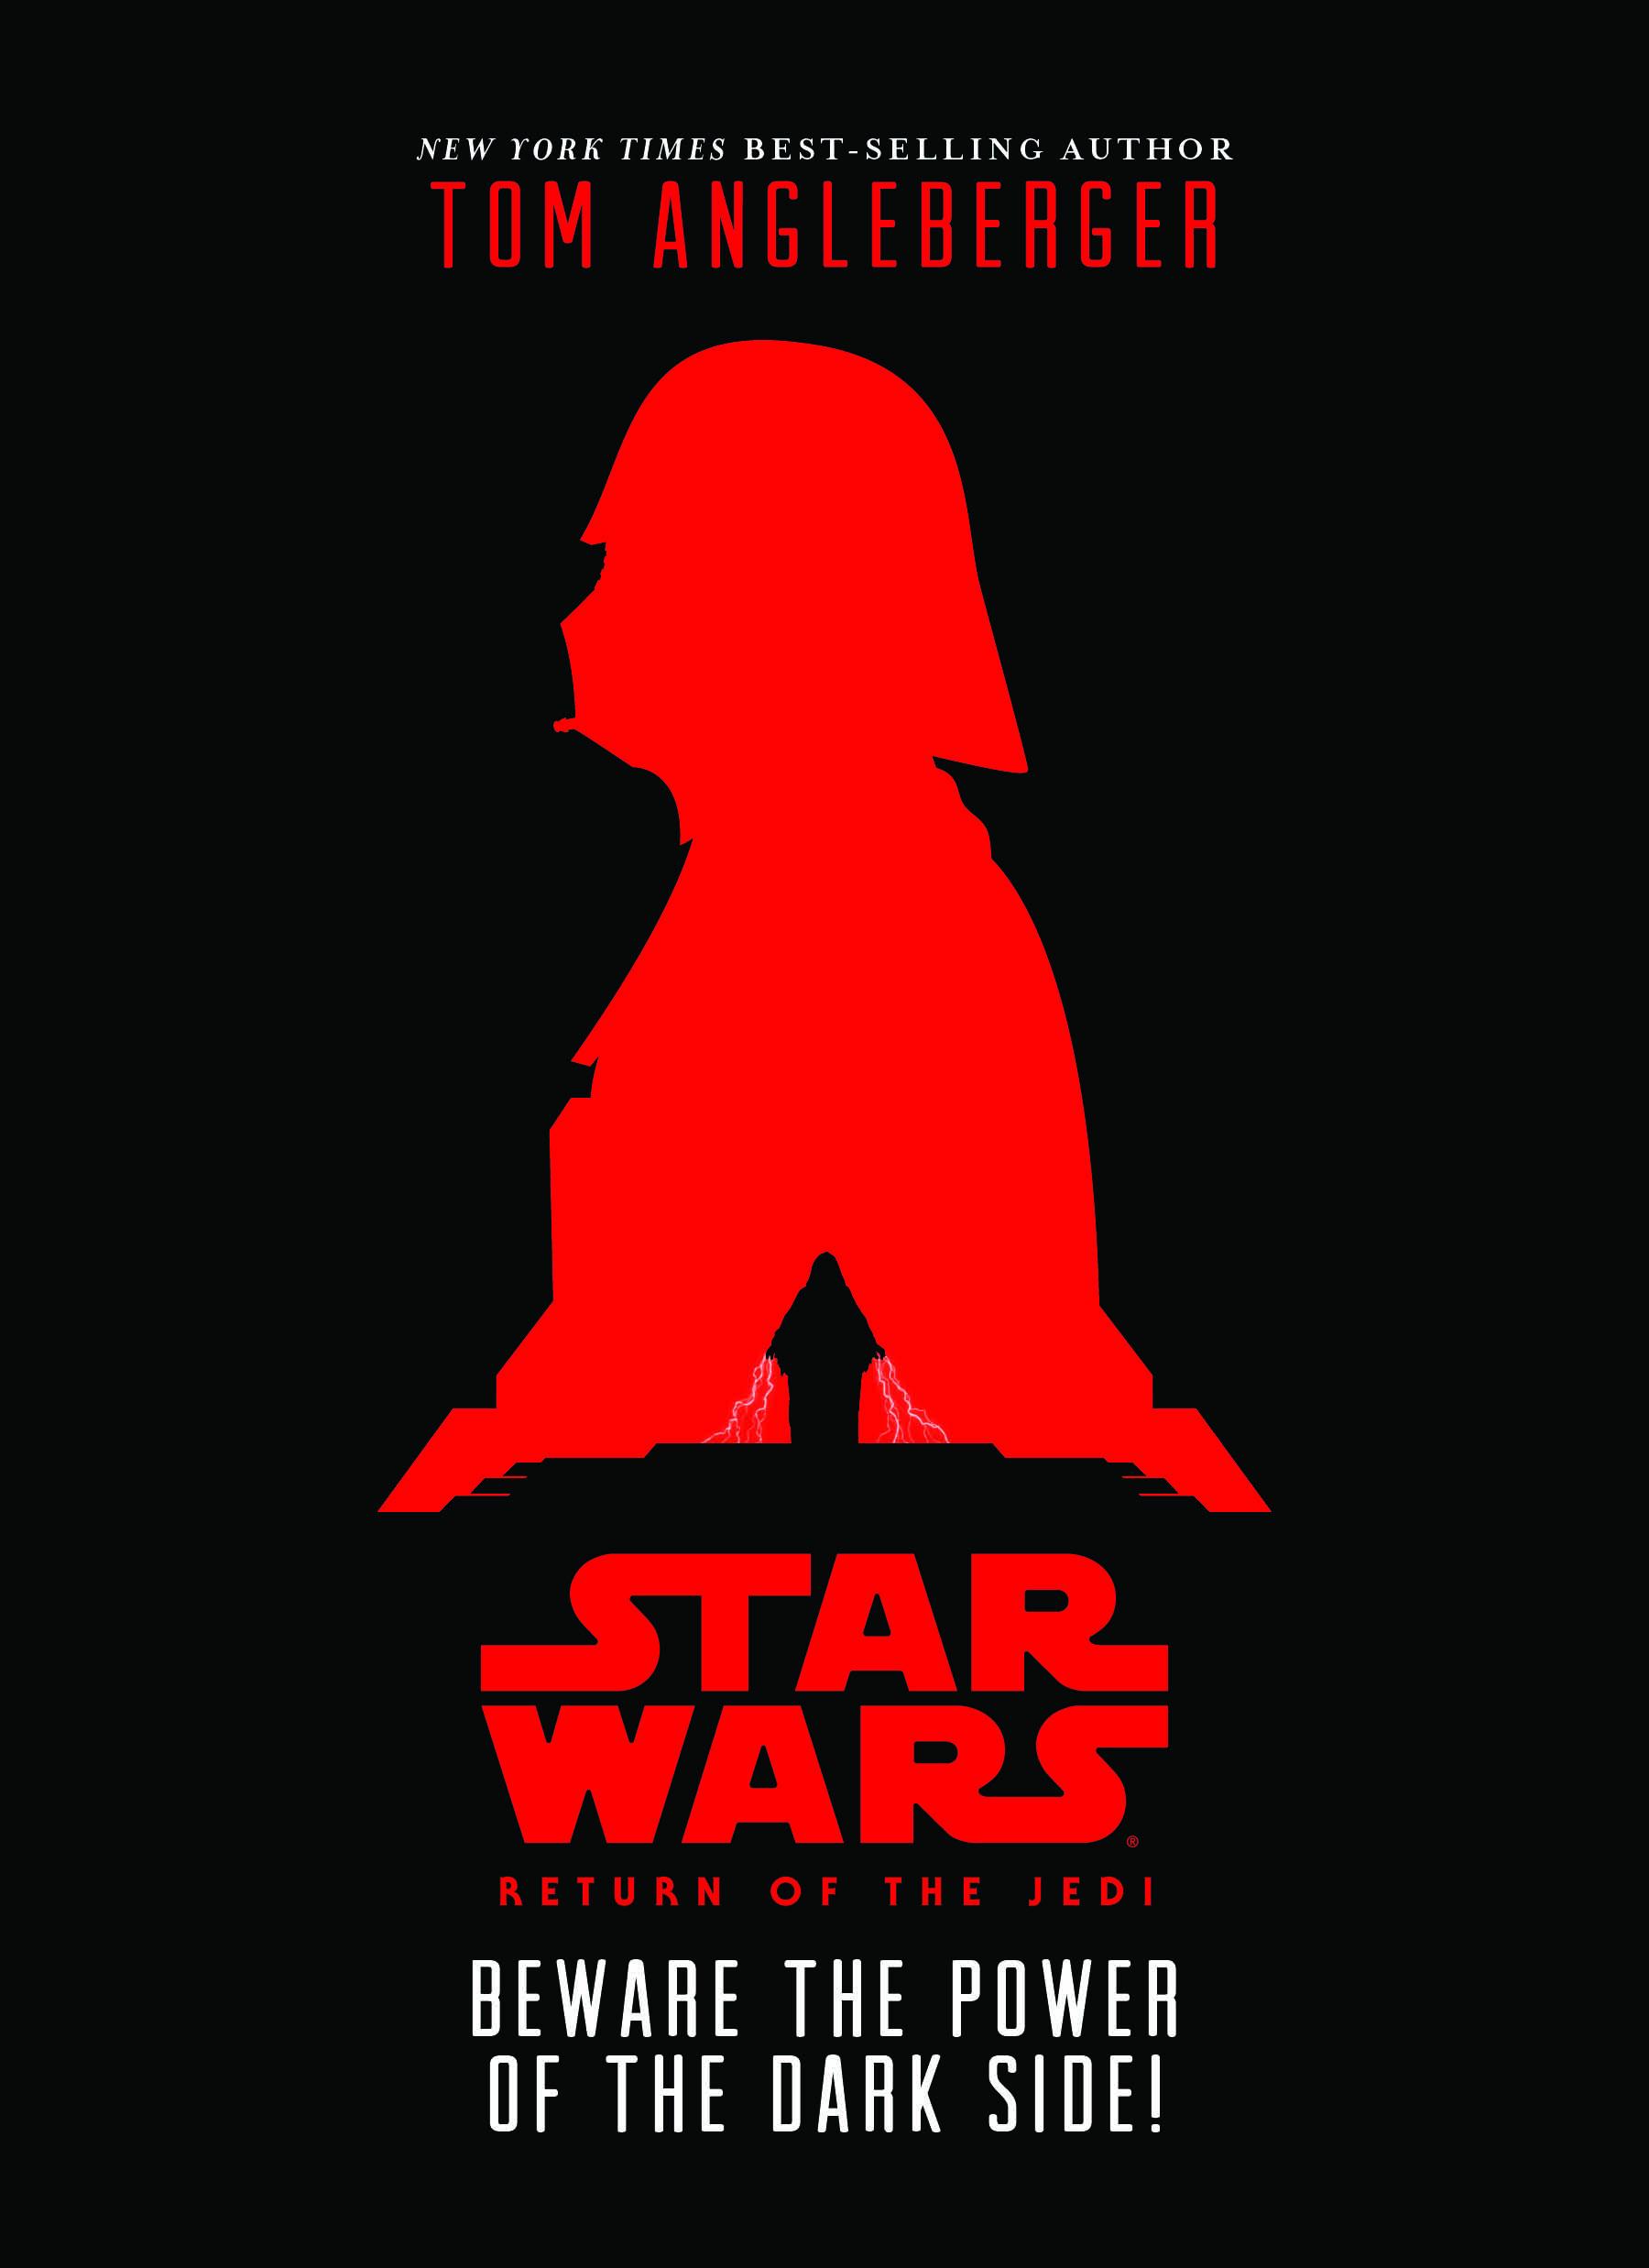 Tom Angleberger – Adding Deep Insight Into the Star Wars ... - photo#43